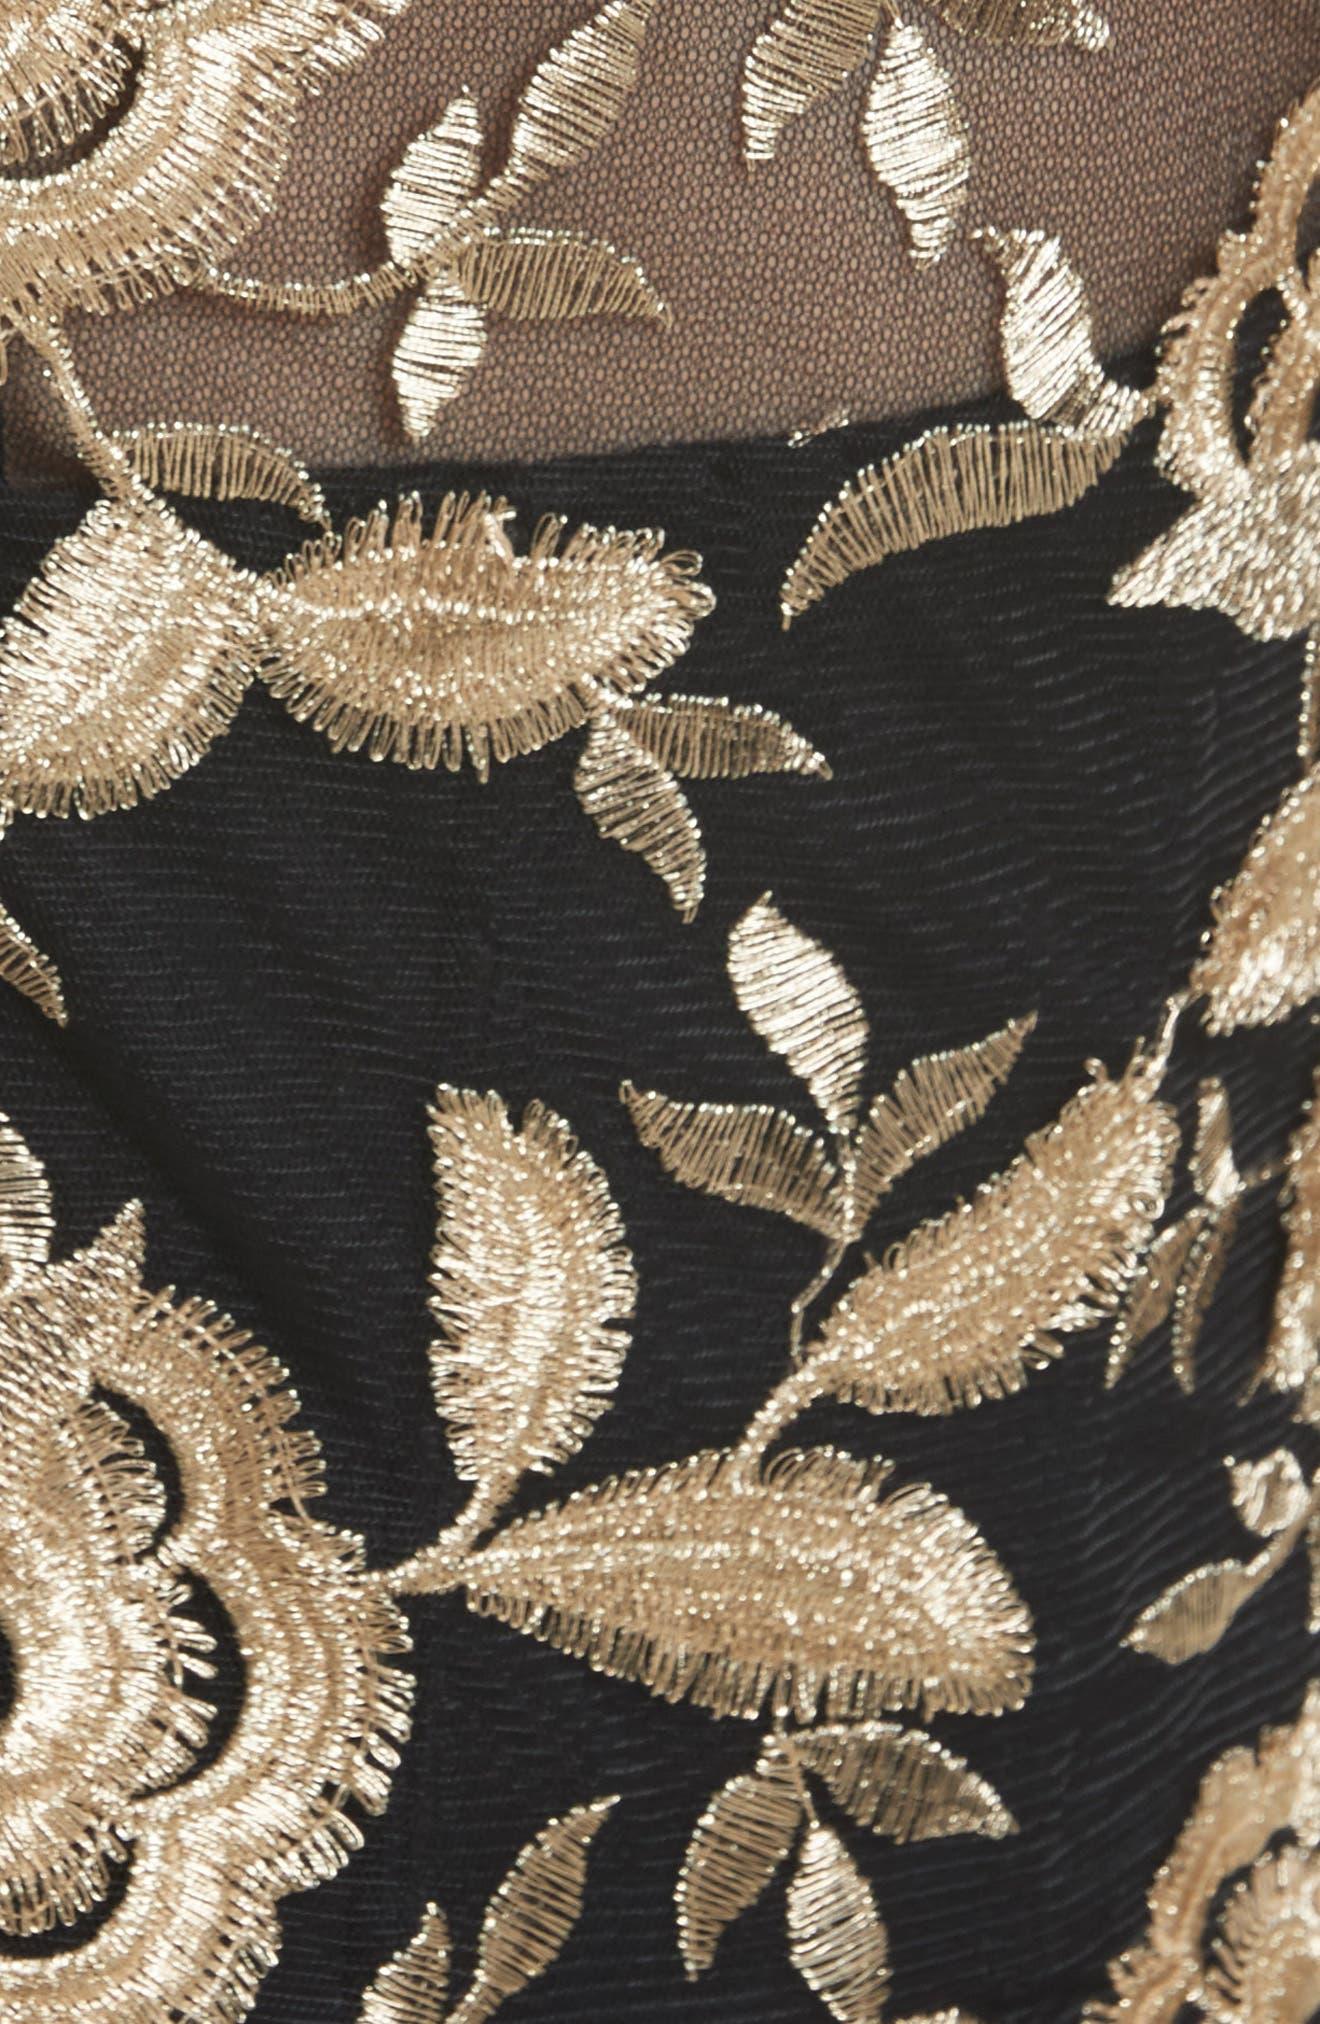 Embroidered Gazar Fit & Flare Dress,                             Alternate thumbnail 3, color,                             Noir/ Gold